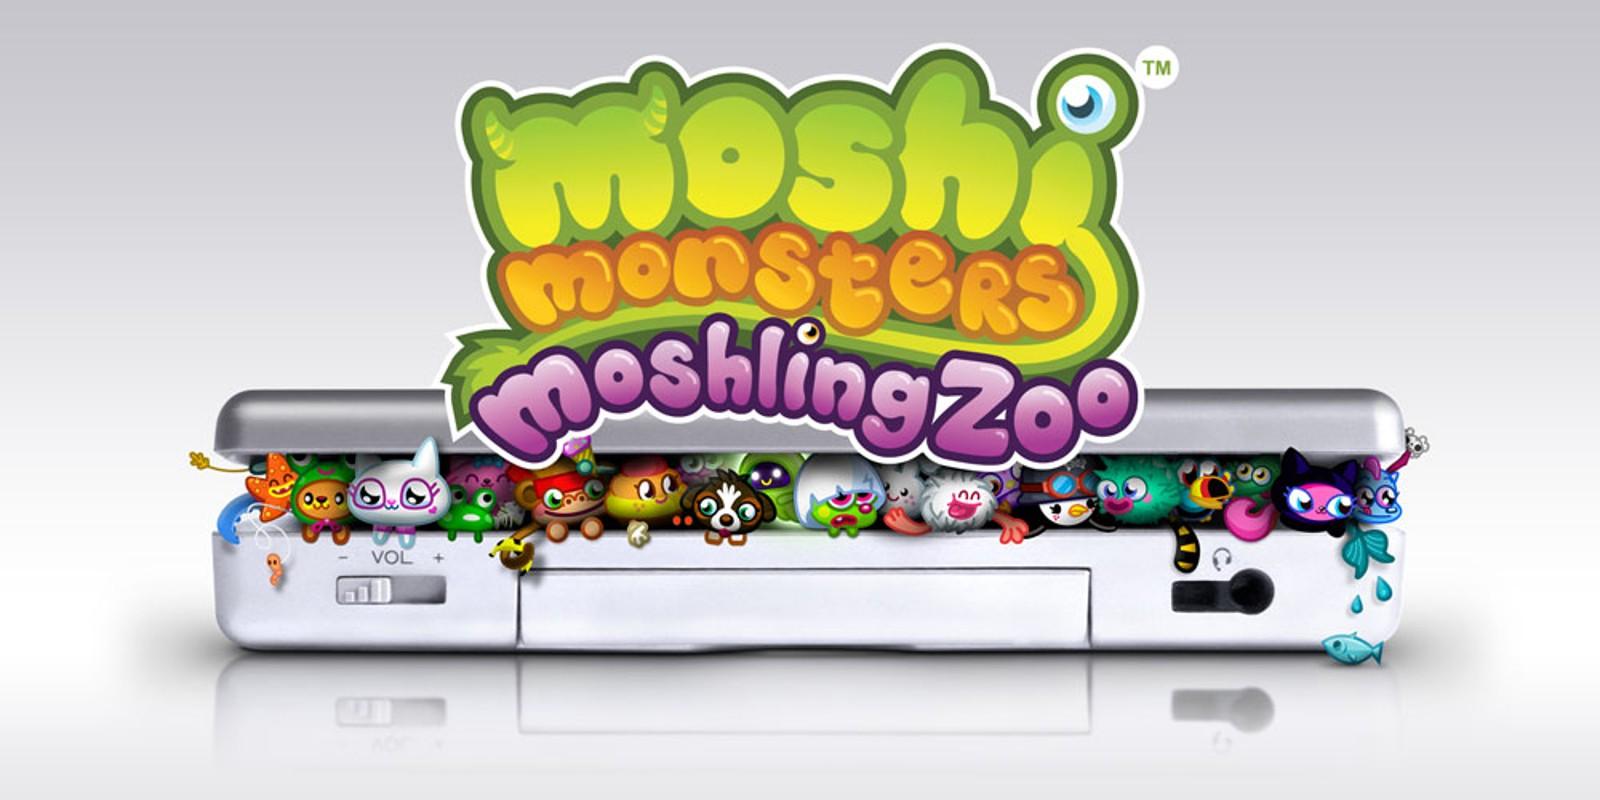 Moshi Monsters Moshling Zoo Nintendo DS Games Nintendo